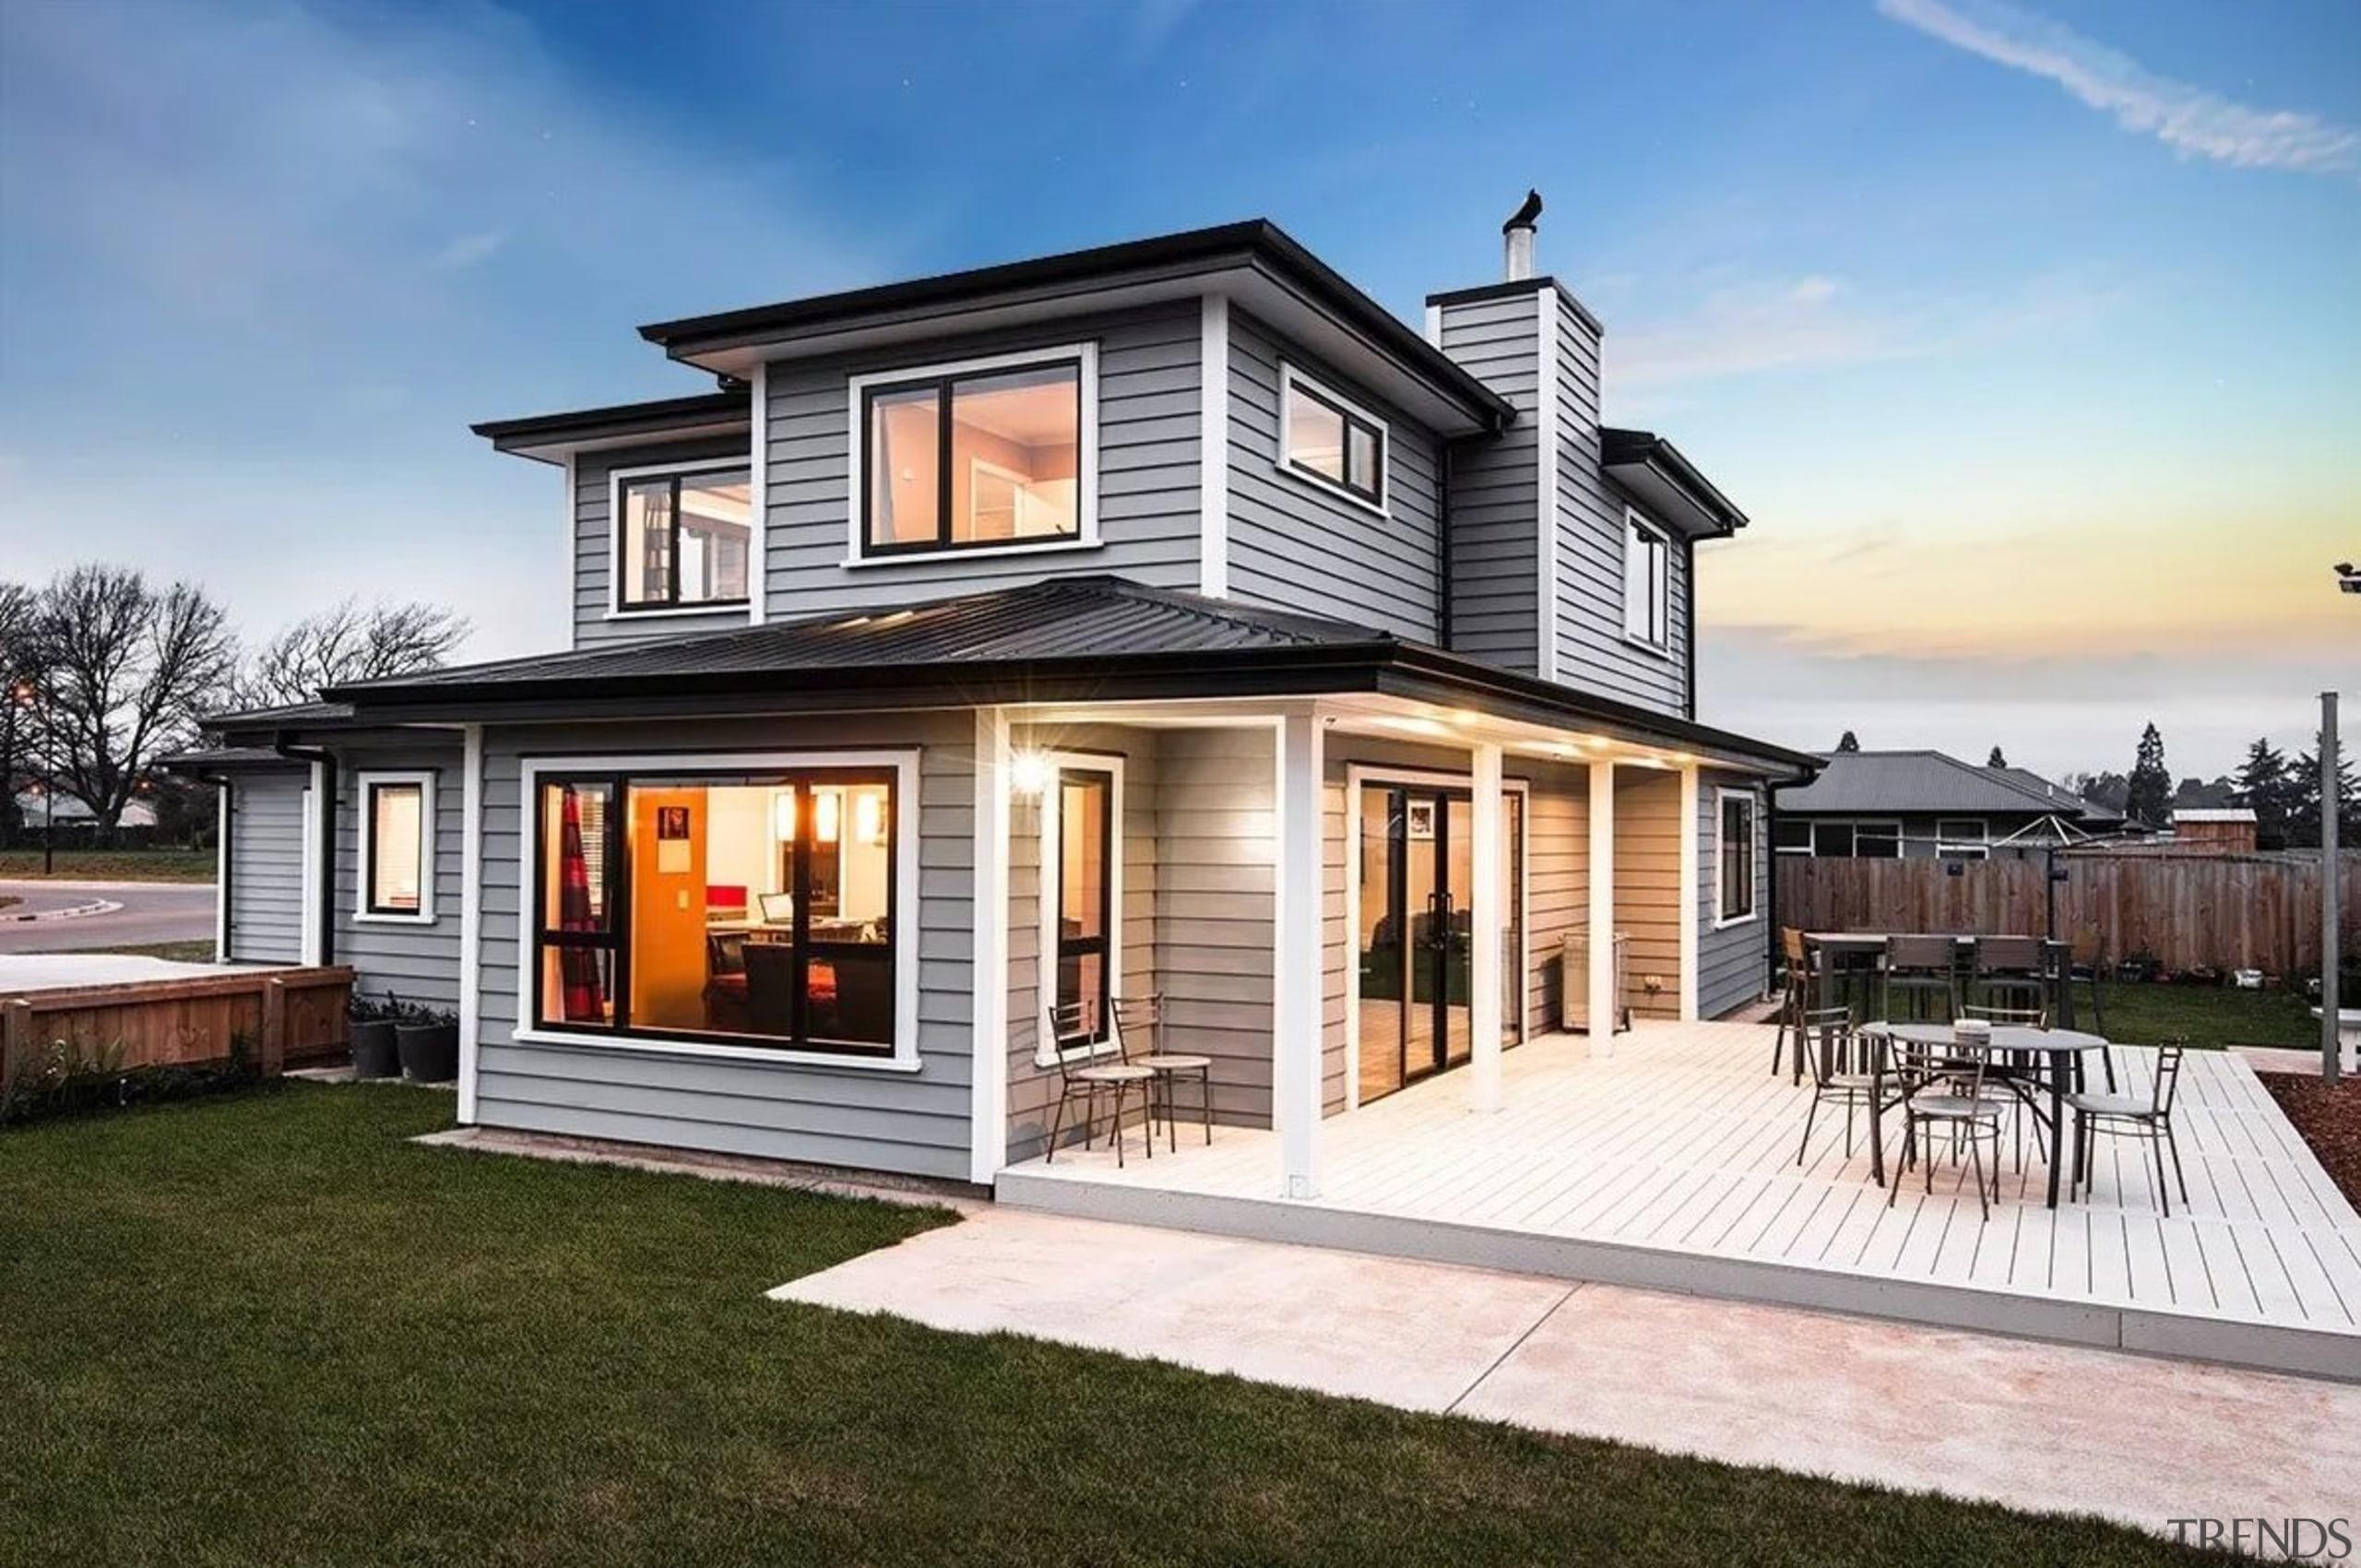 Envira bevel back weatherboards - Envira bevel back elevation, facade, home, house, property, real estate, residential area, siding, white